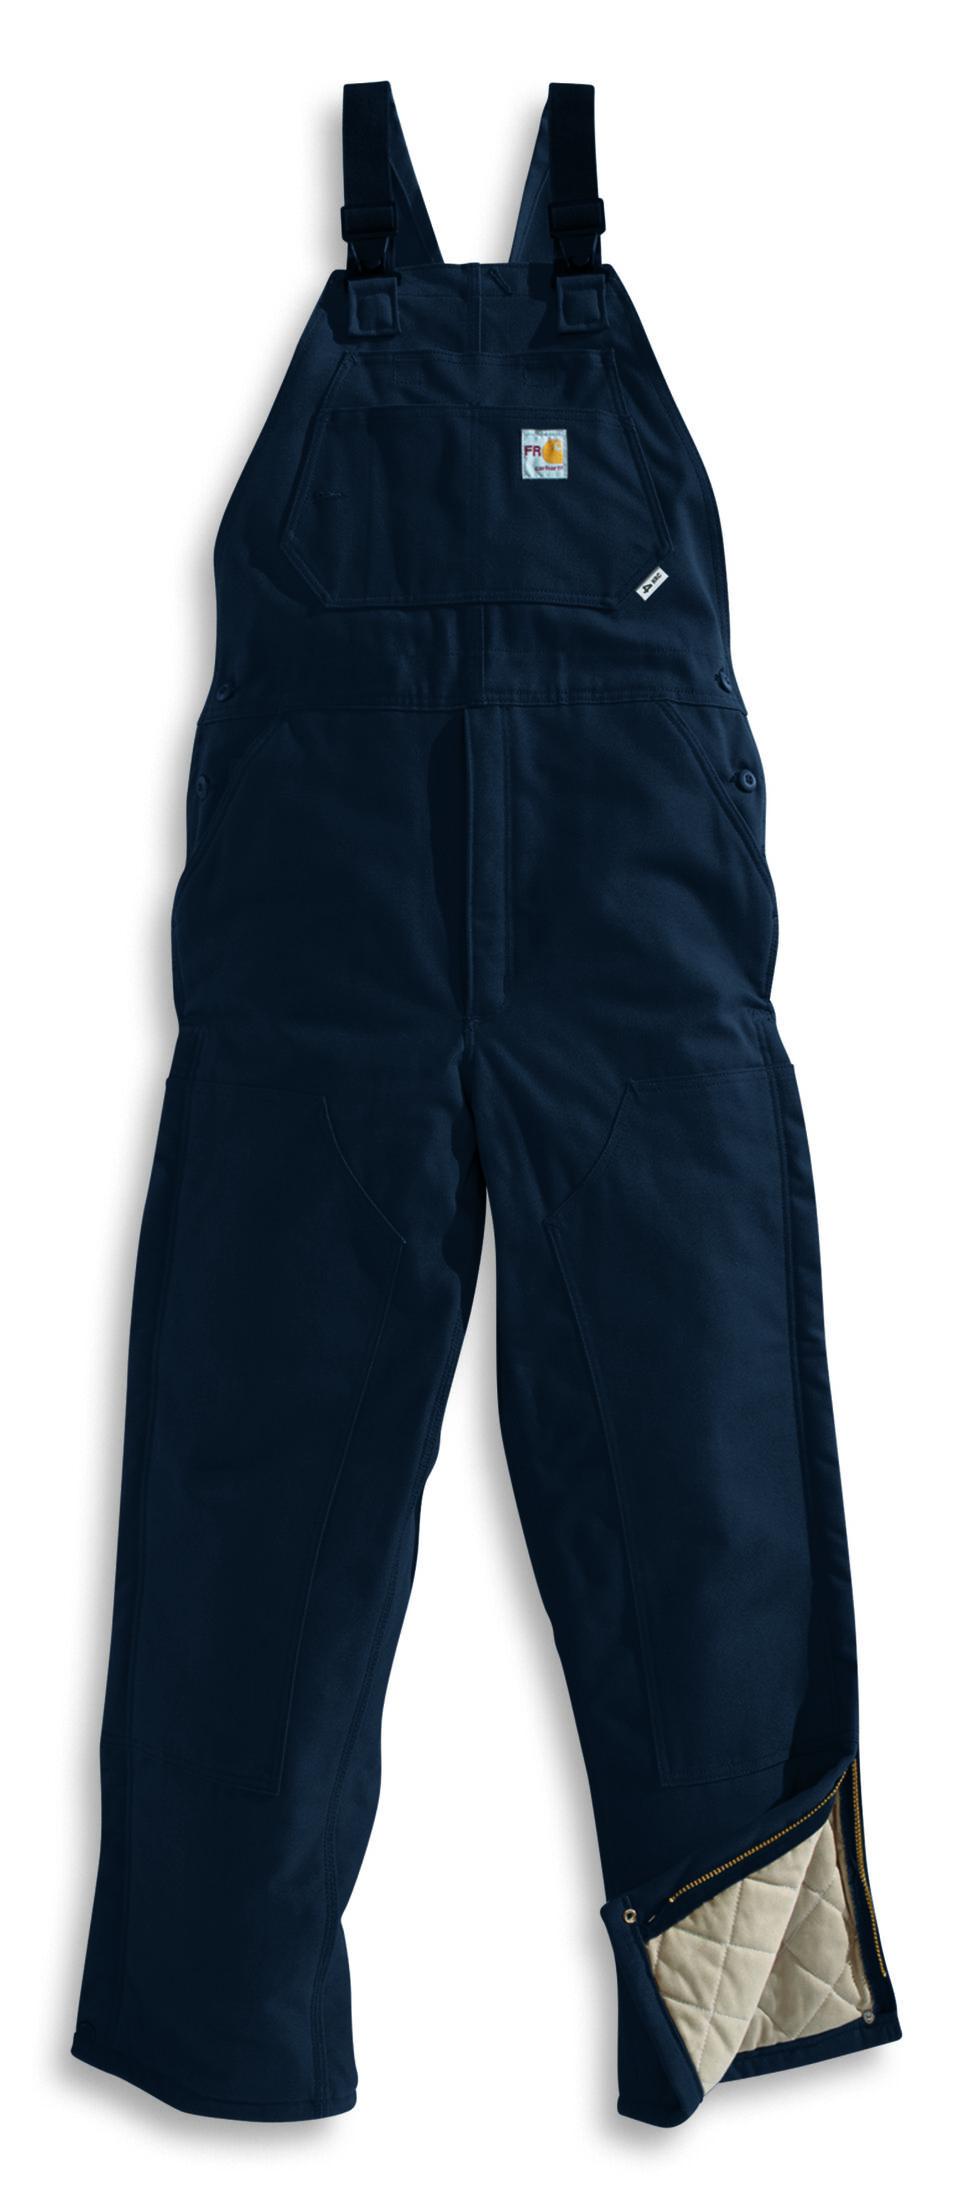 Carhartt Men's Flame-Resistant Duck Quilt-Lined Bib Overalls - Big & Tall, Navy, hi-res